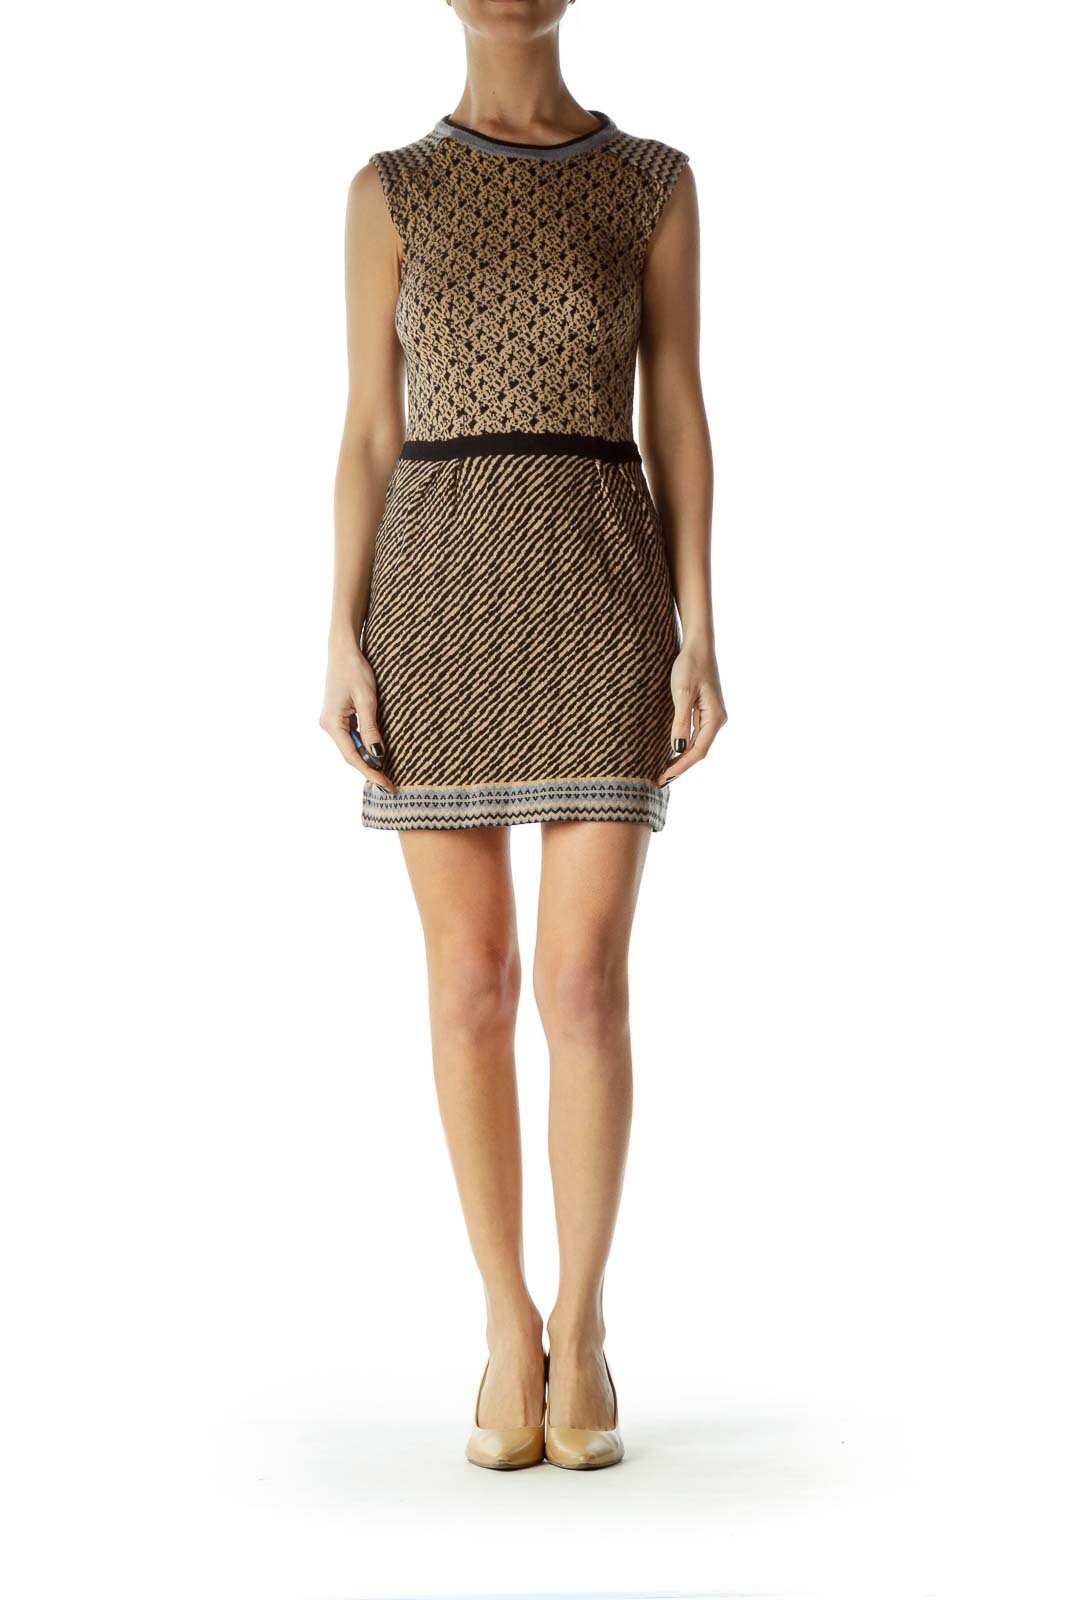 Beige Black Printed Sleeveless Knit Dress